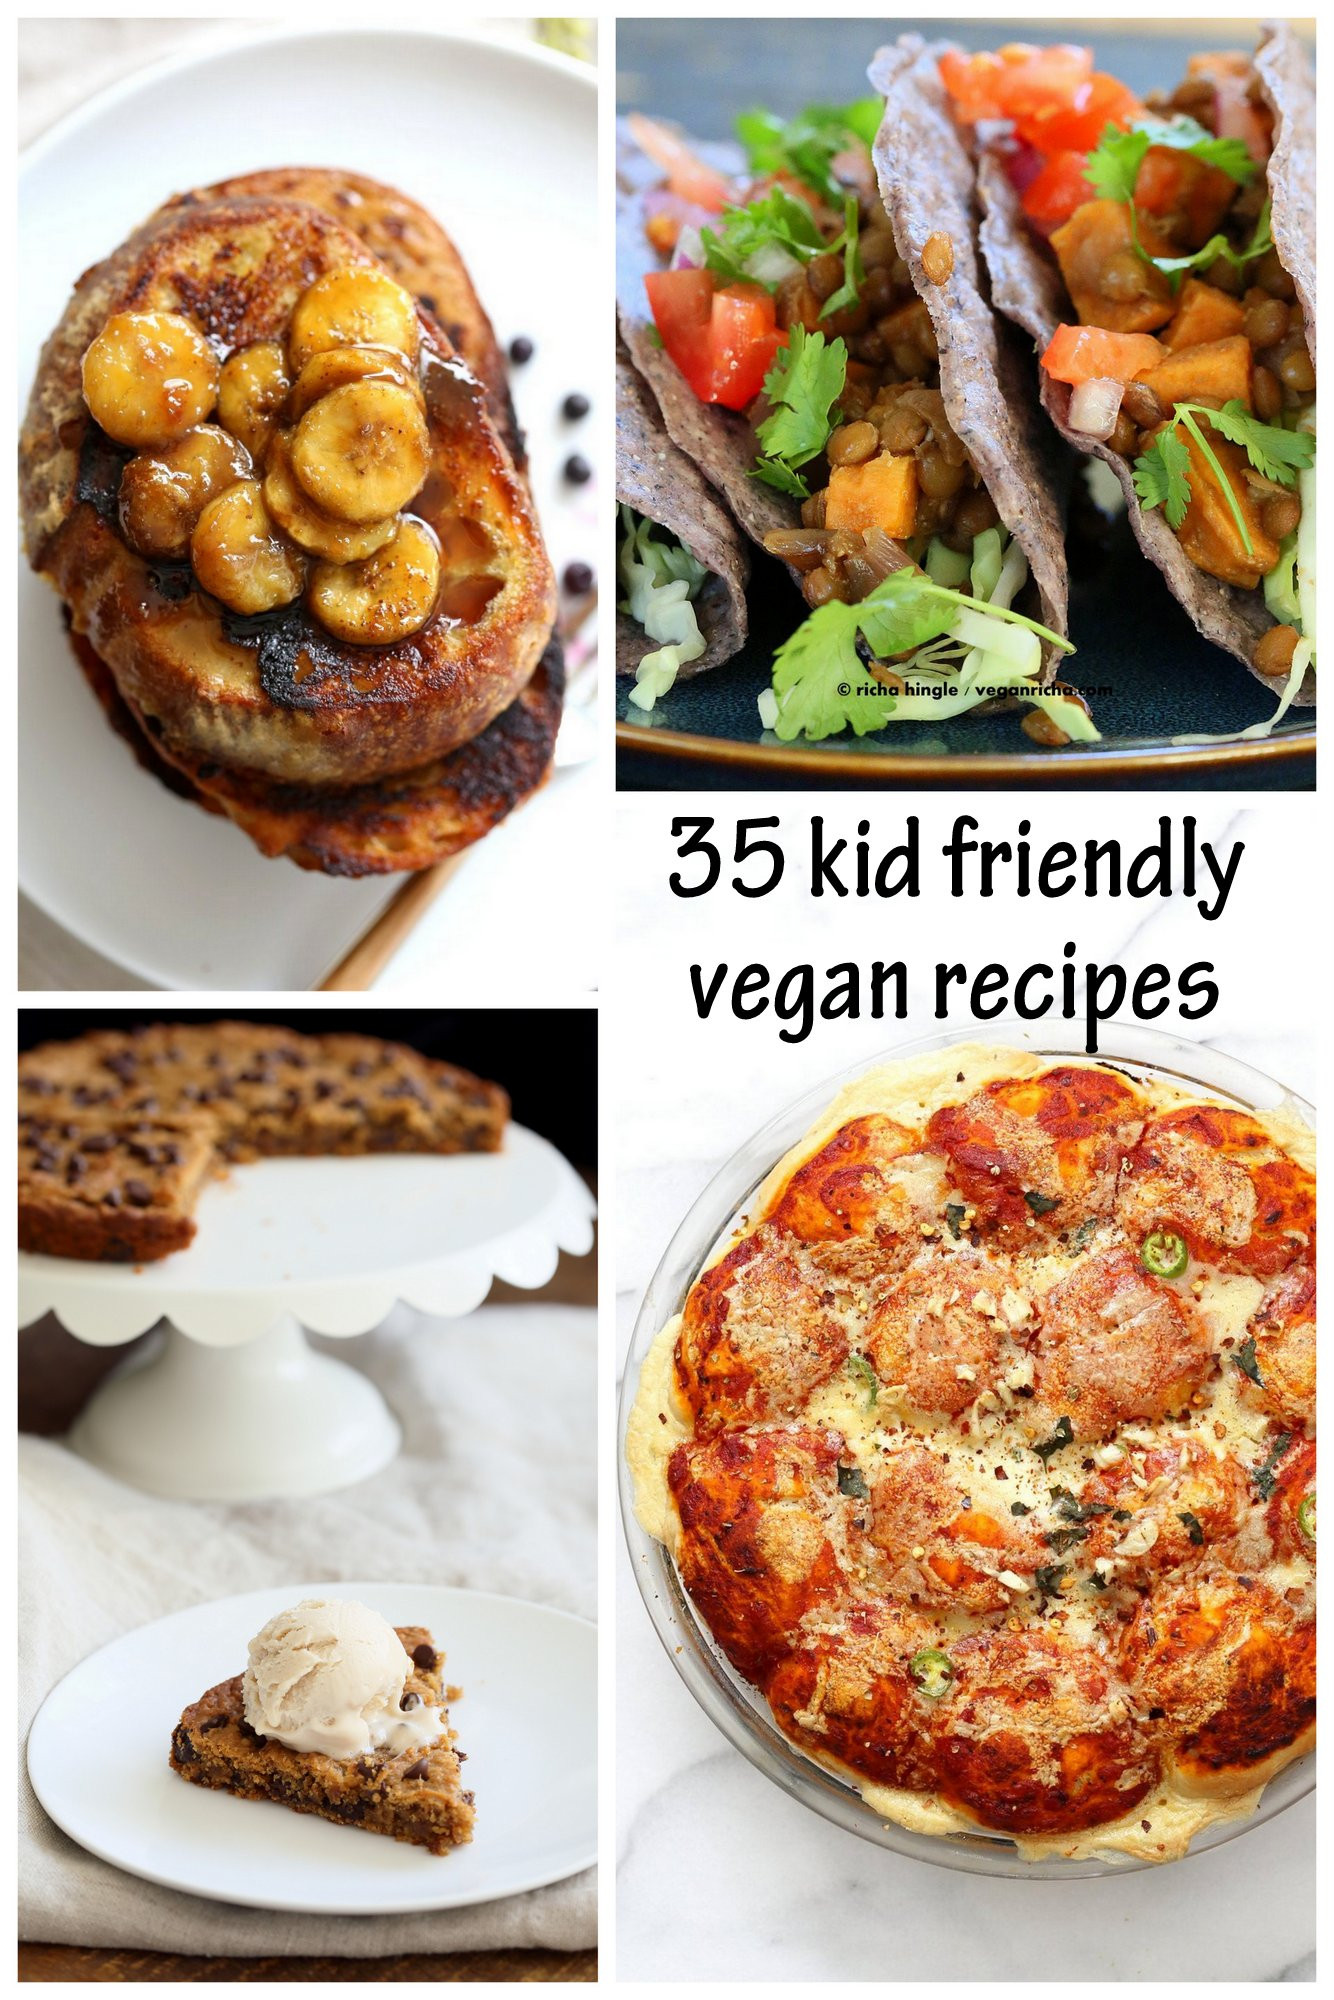 Easy Healthy Dinner Recipes Kid Friendly  35 Kid Friendly Vegan Recipes Vegan Richa